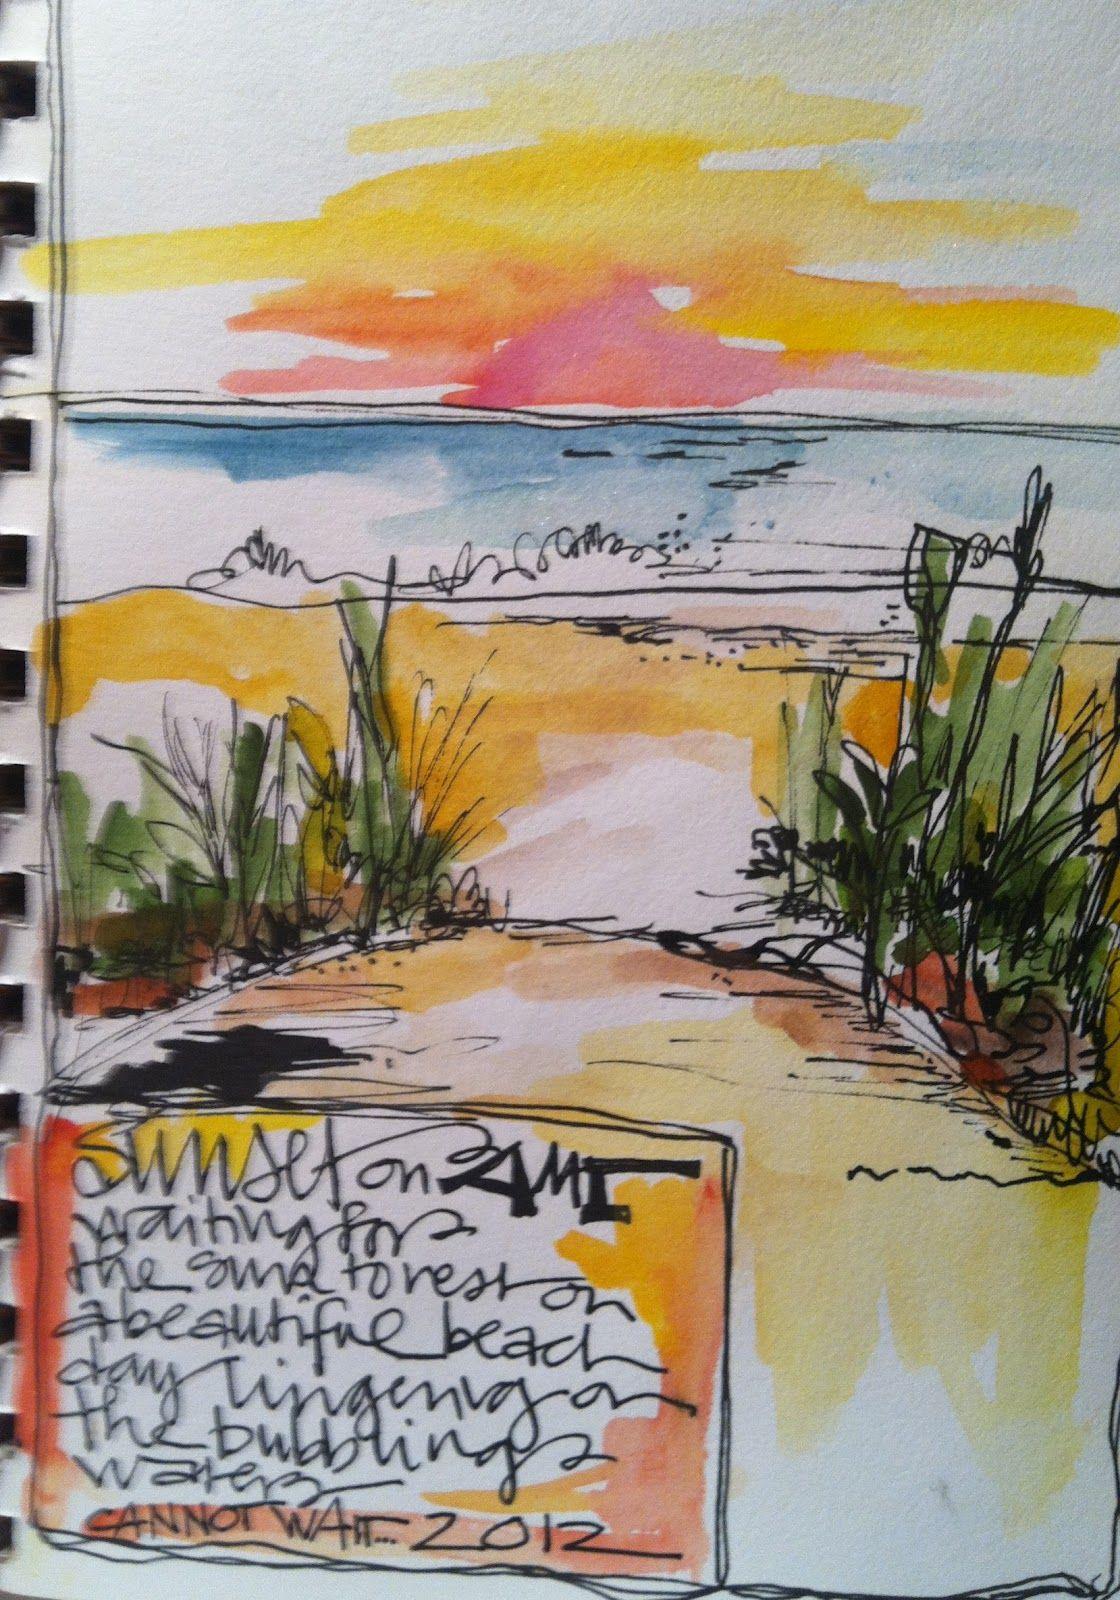 Whimspirations Doodle 365 Watercolor Art Journal Art